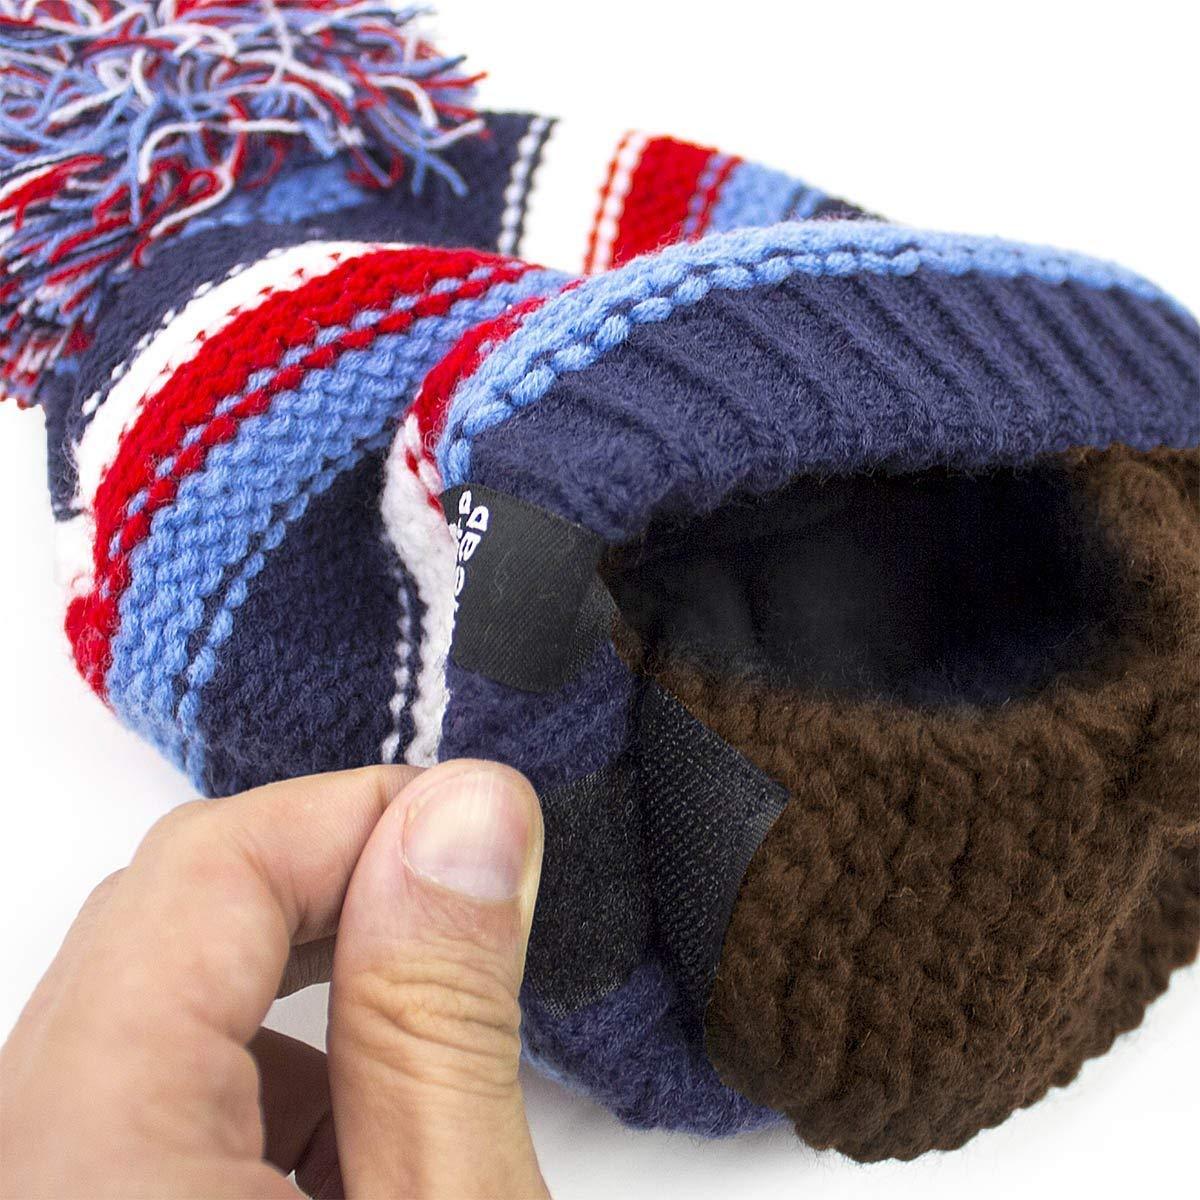 24ba409f5450f Beard Head Kid Gromm Beard Beanie -Knit Hat and Fake Beard for Kids and  Toddlers KD1001BR